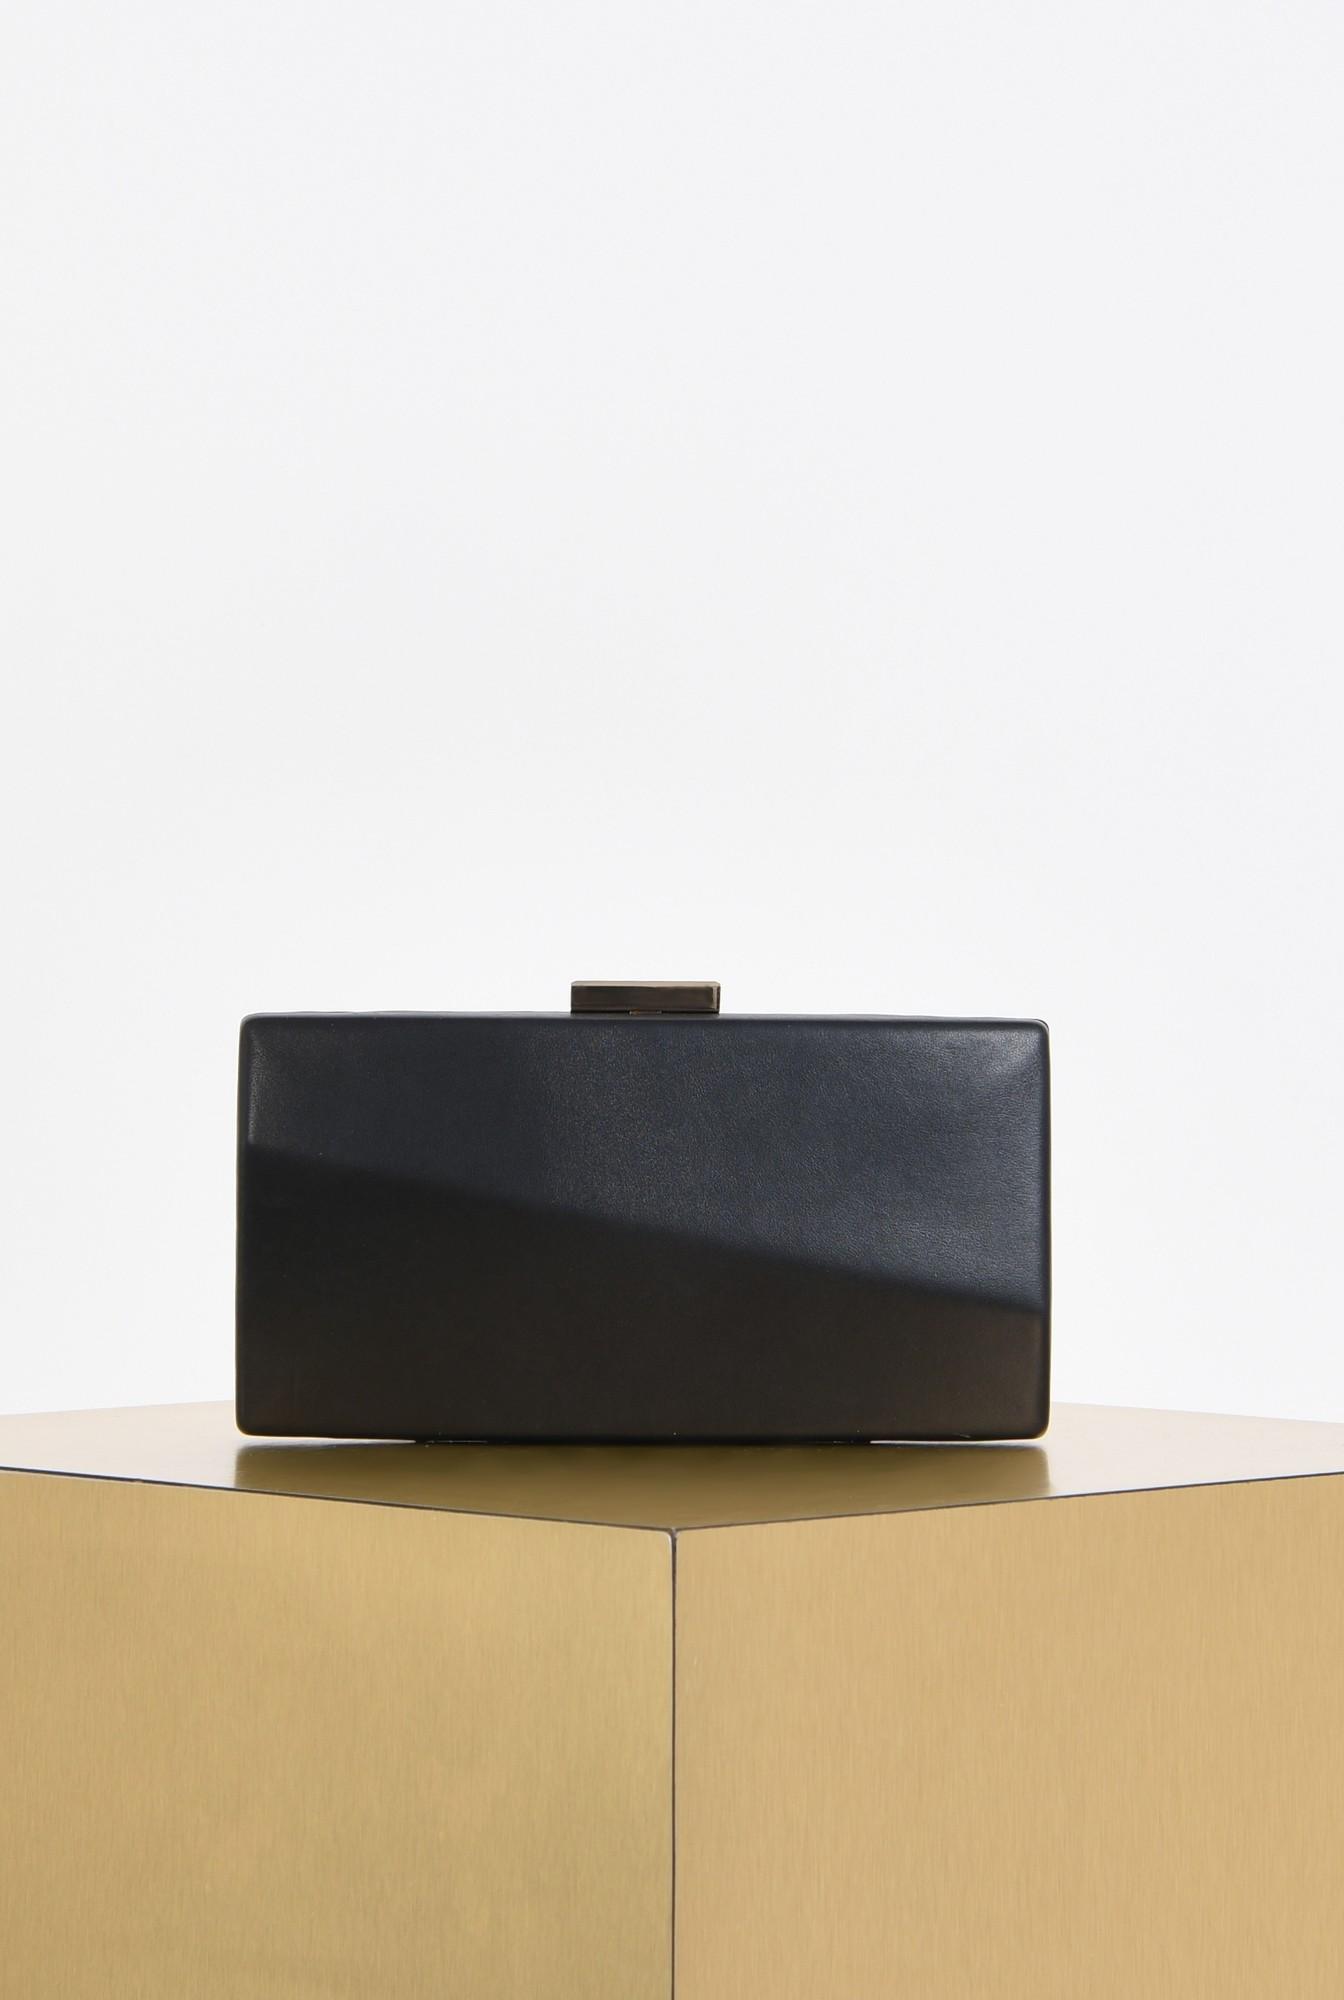 0 - plic elegant, negru, piele eco, lant detasabil